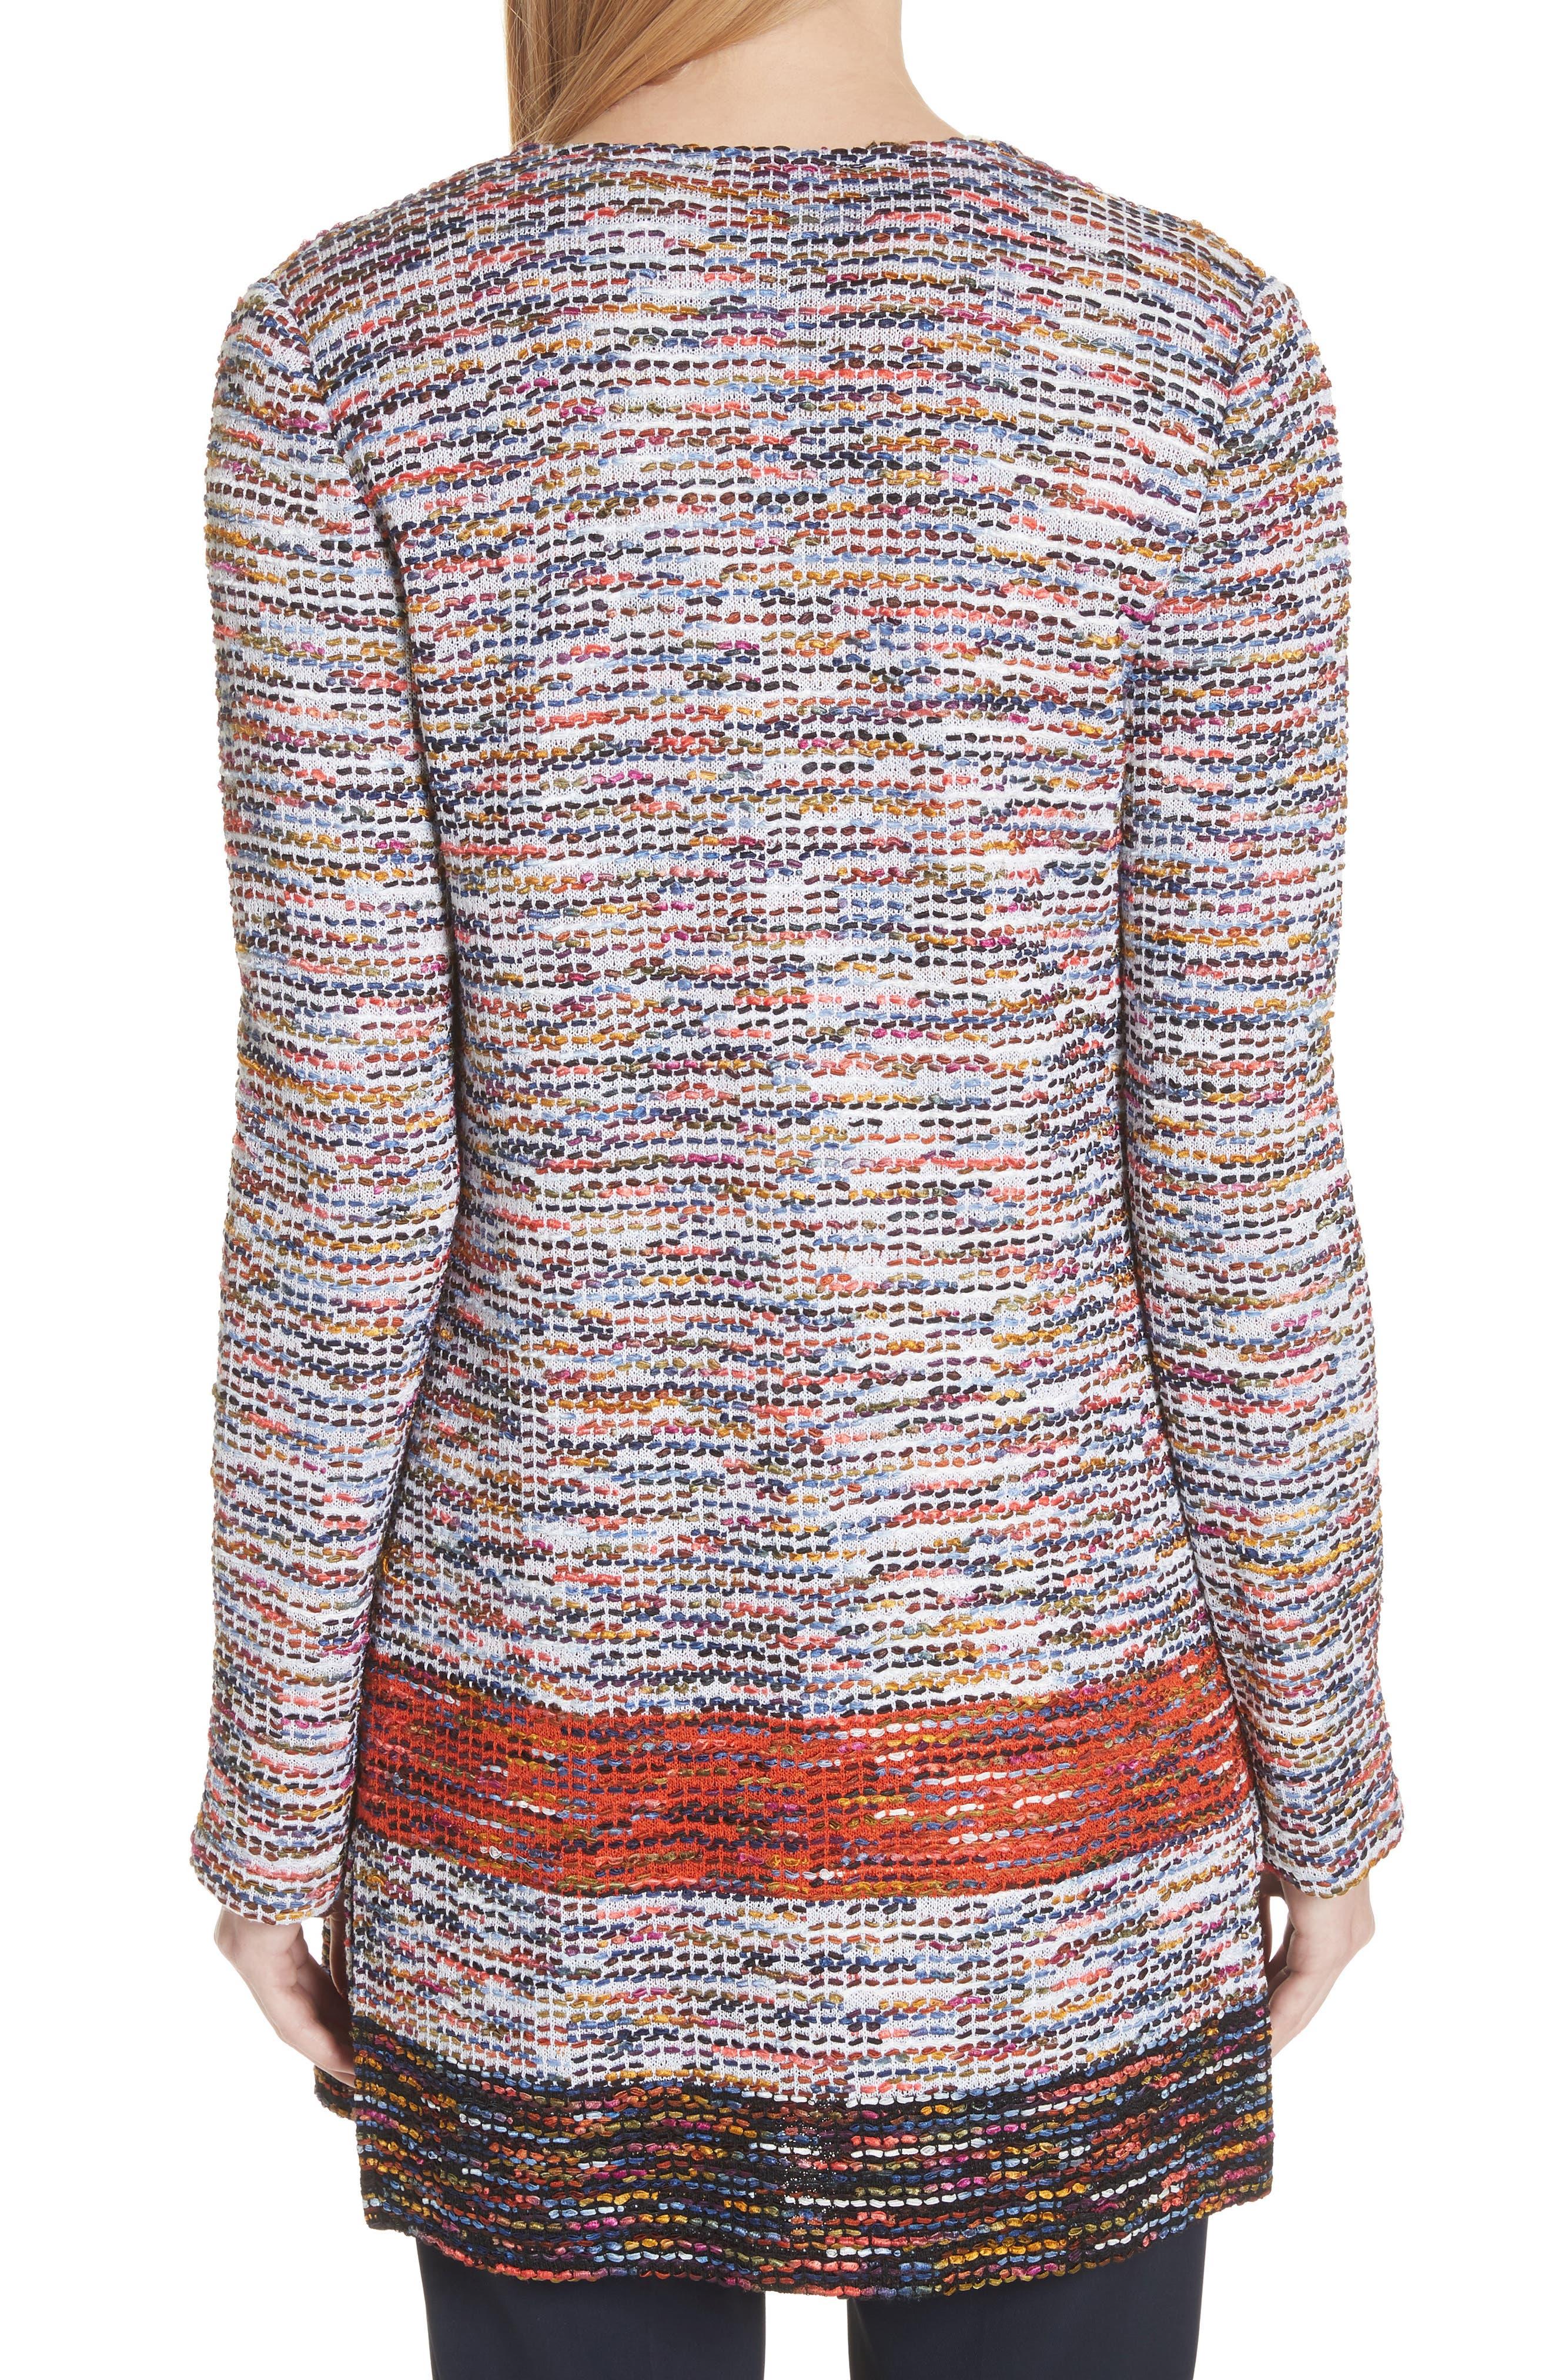 Vertical Fringe Multi Tweed Knit Waterfall Cardigan,                             Alternate thumbnail 2, color,                             SIENNA MULTI